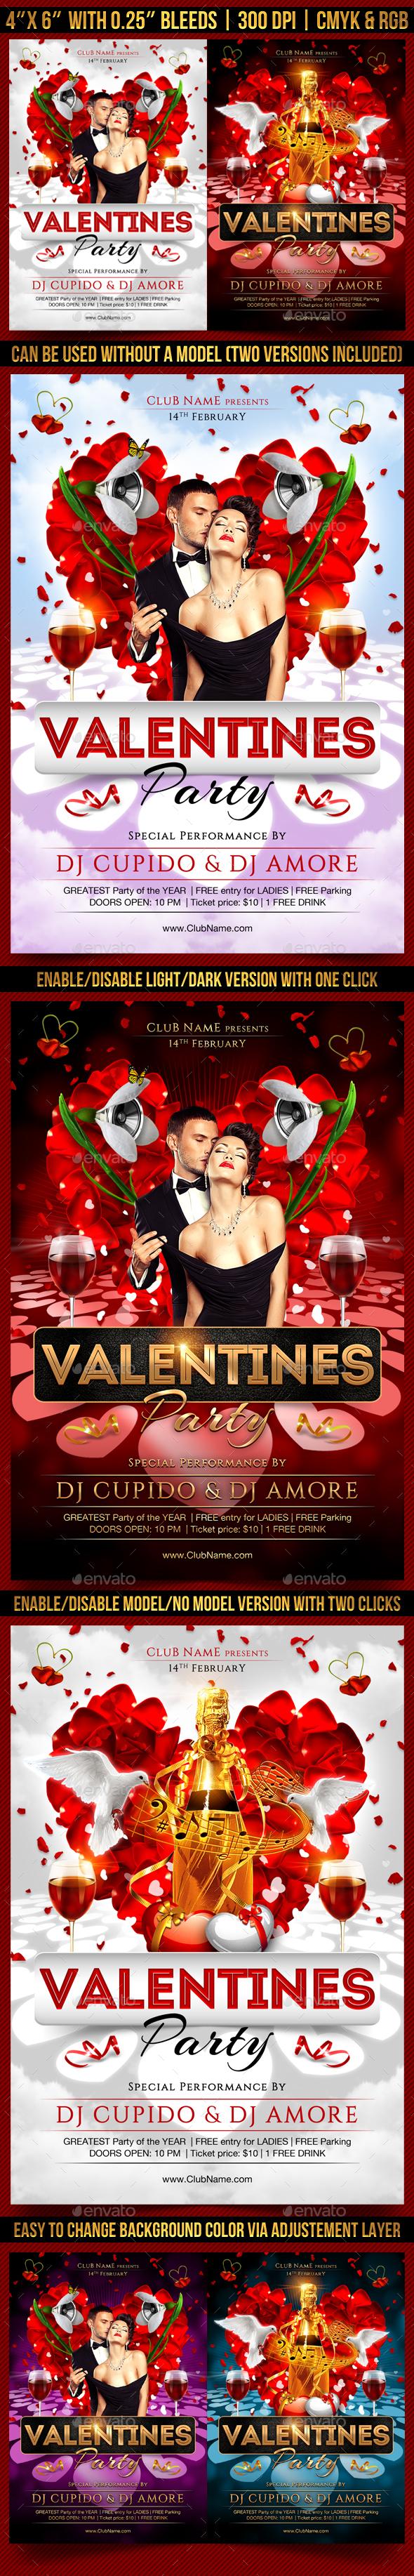 Valentines Party Flyer | Valentines Day Templates | Pinterest ...